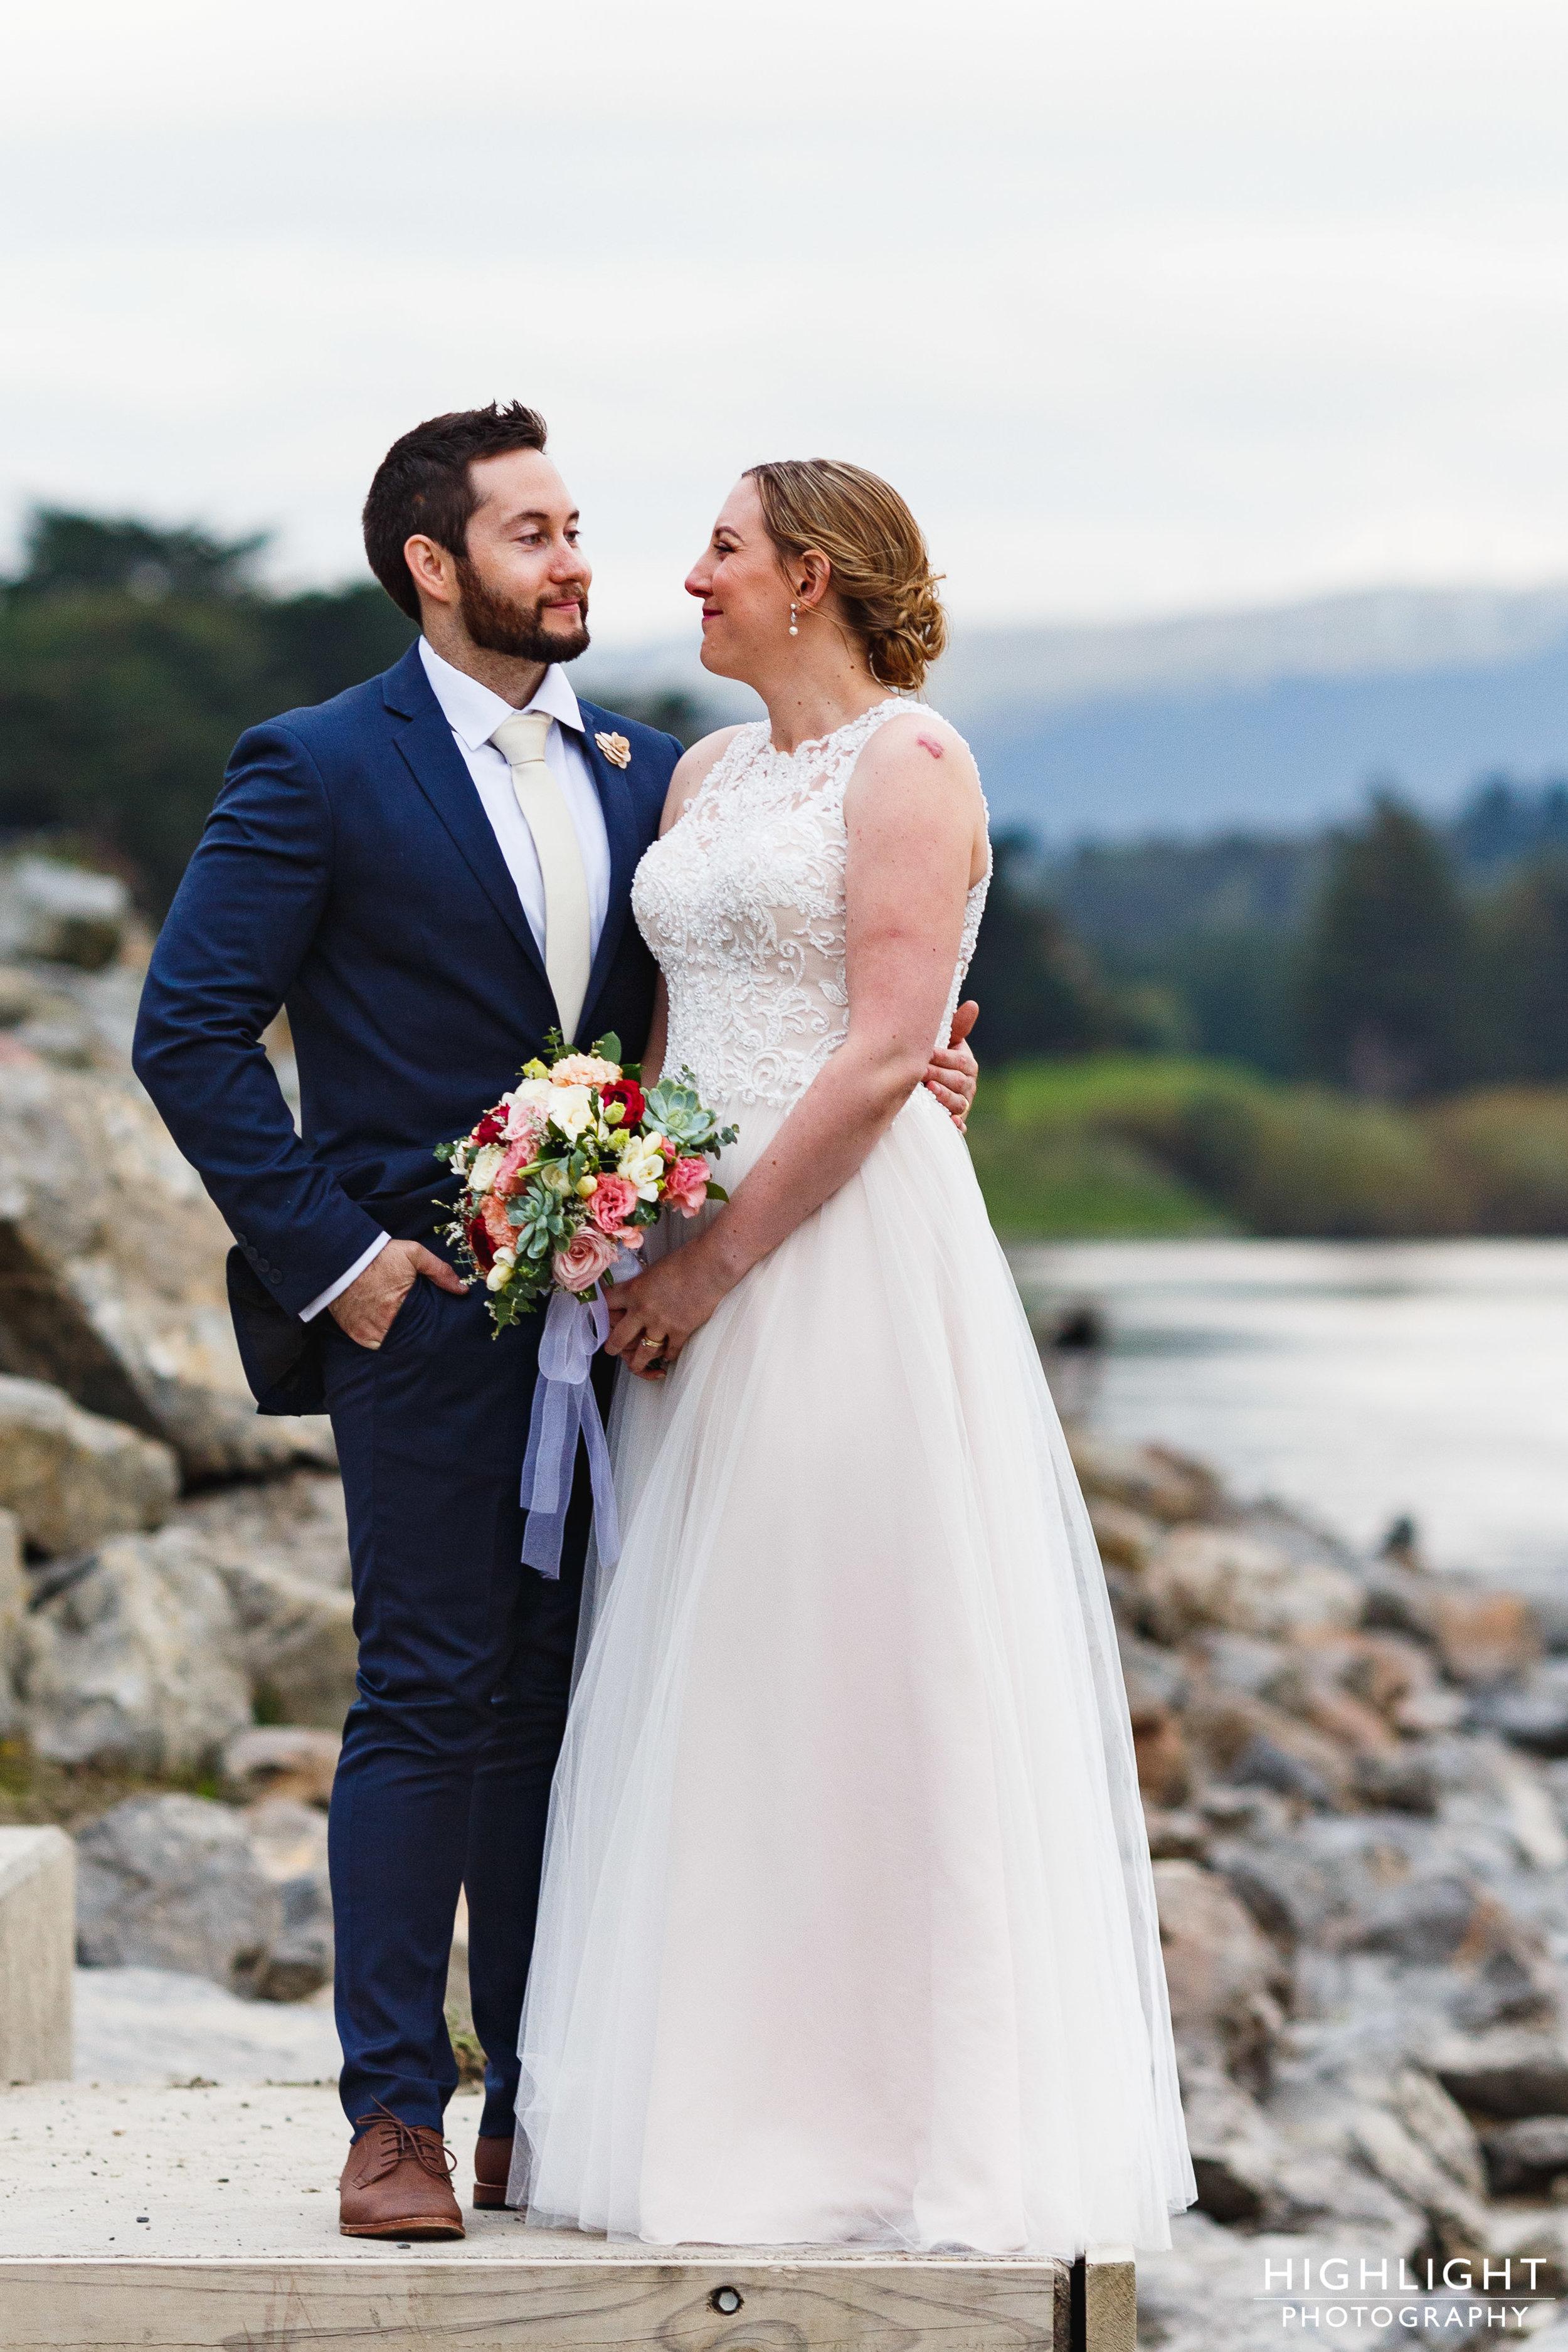 highlight-wedding-photography-palmerston-north-new-zealand-manawatu-chalet-97.jpg